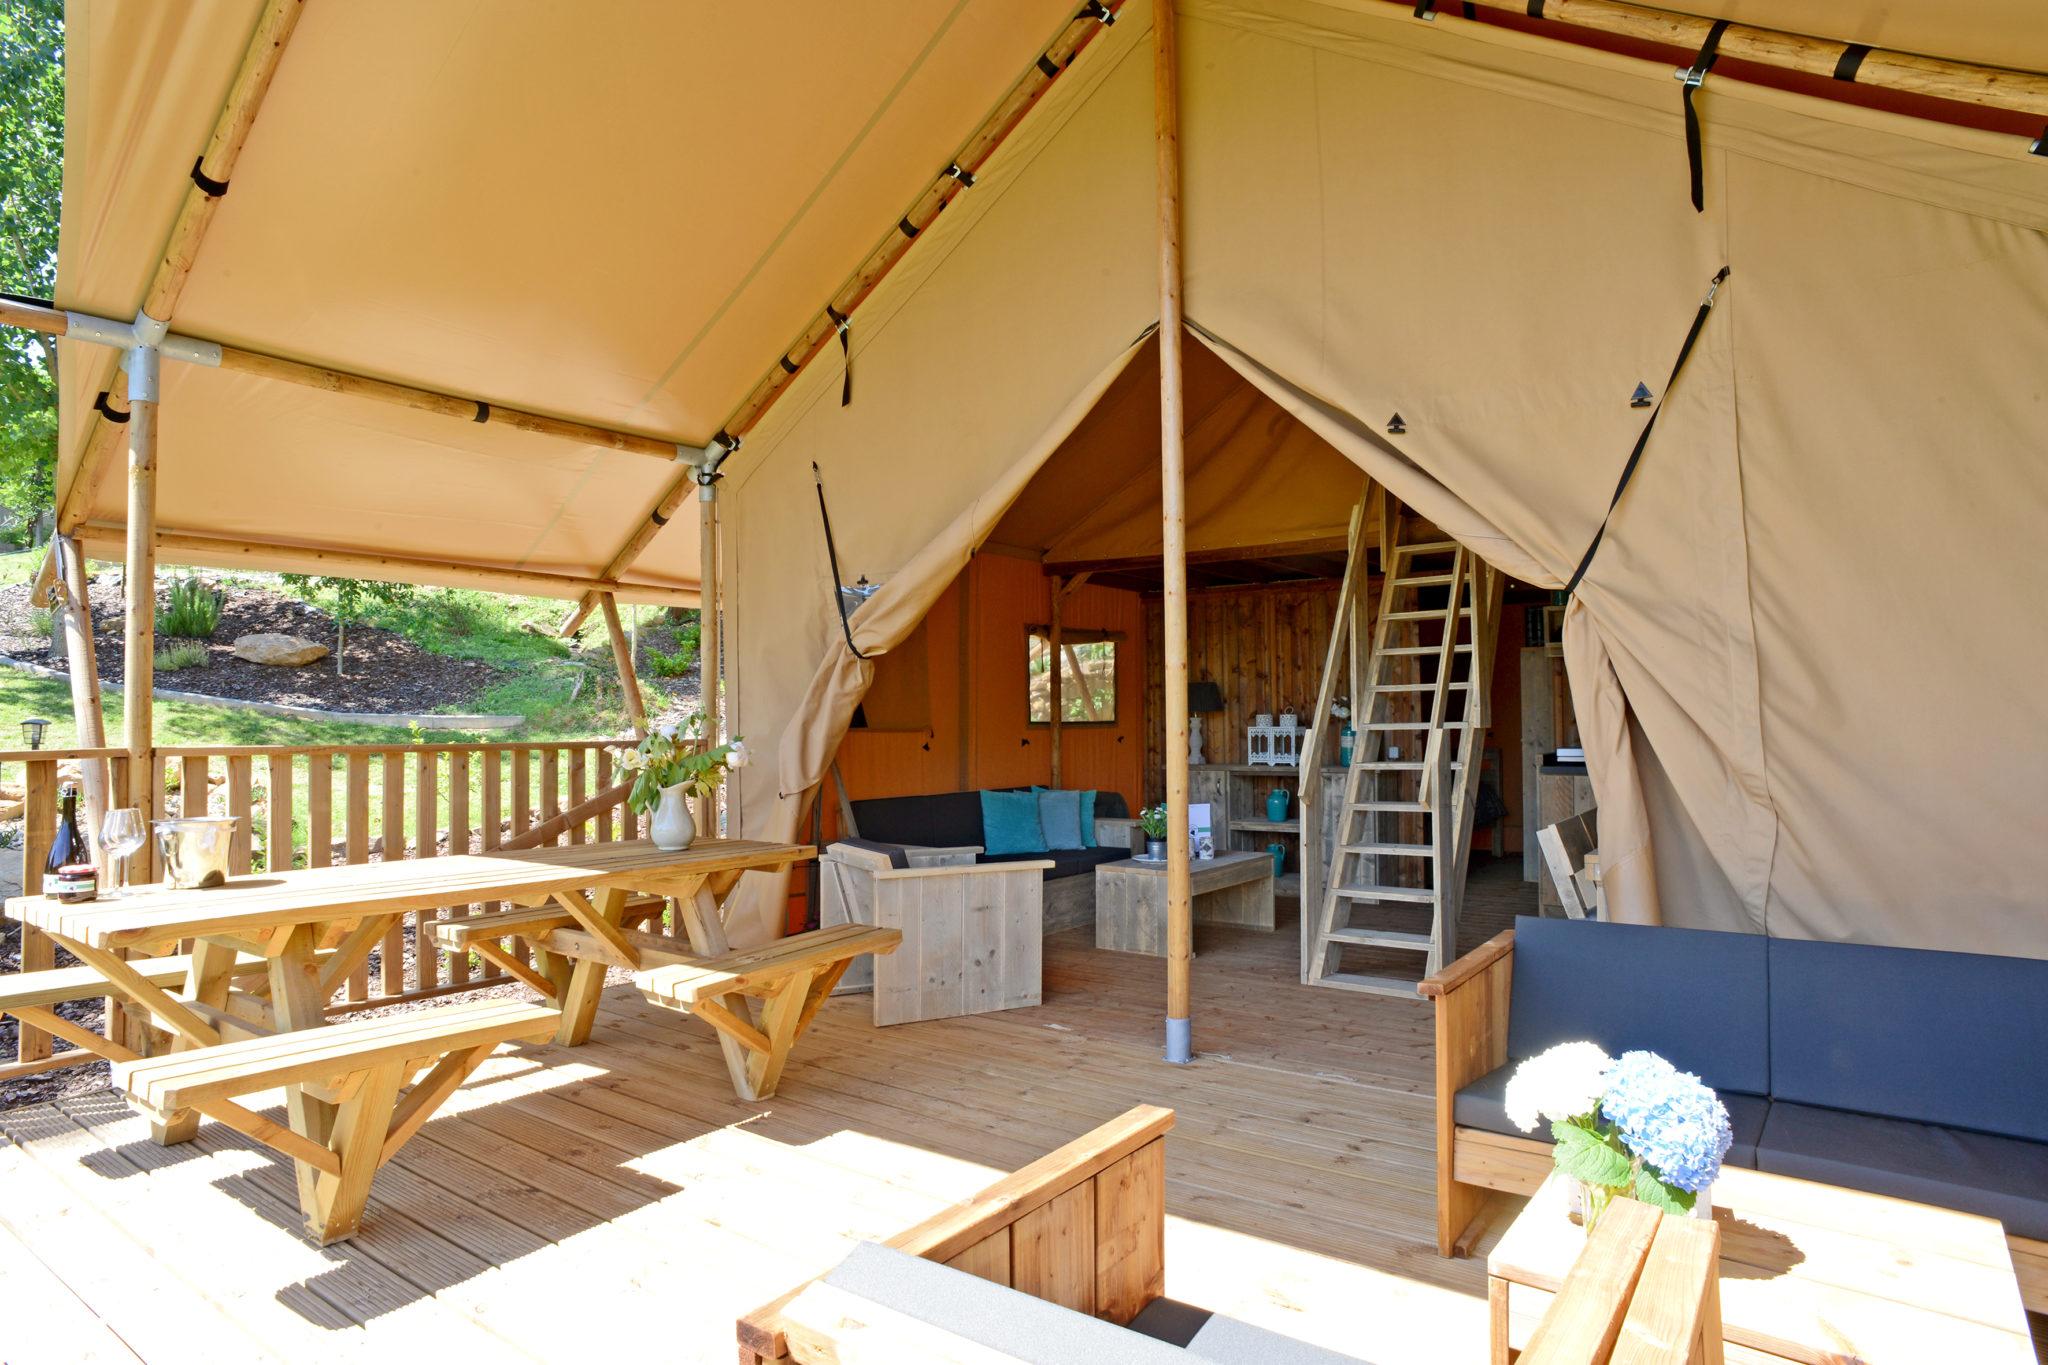 Extend the lifespan of safari tents